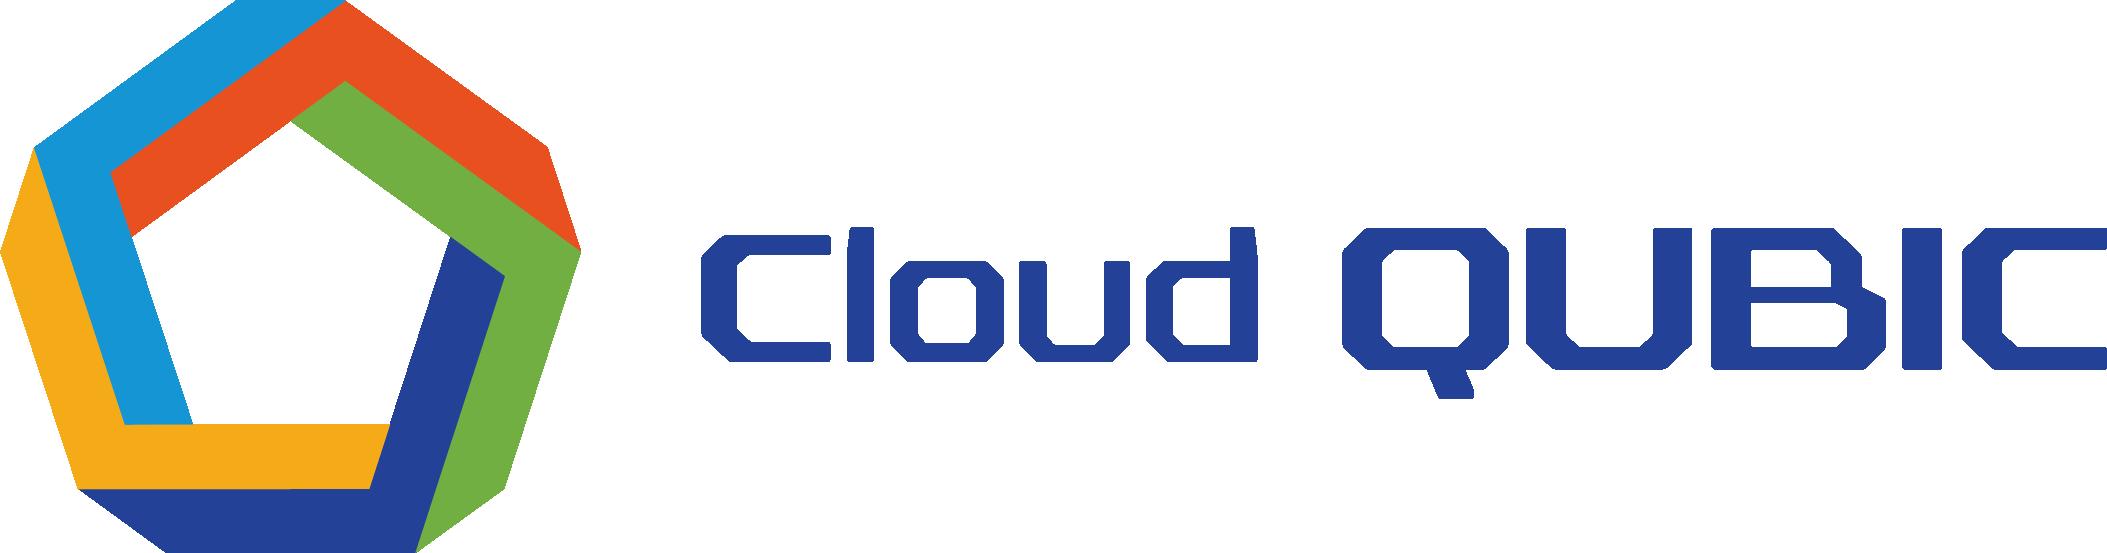 「Cloud QUBIC クラウド キュービック」制作支援クラウドプラットフォームサービス/キュービック株式会社